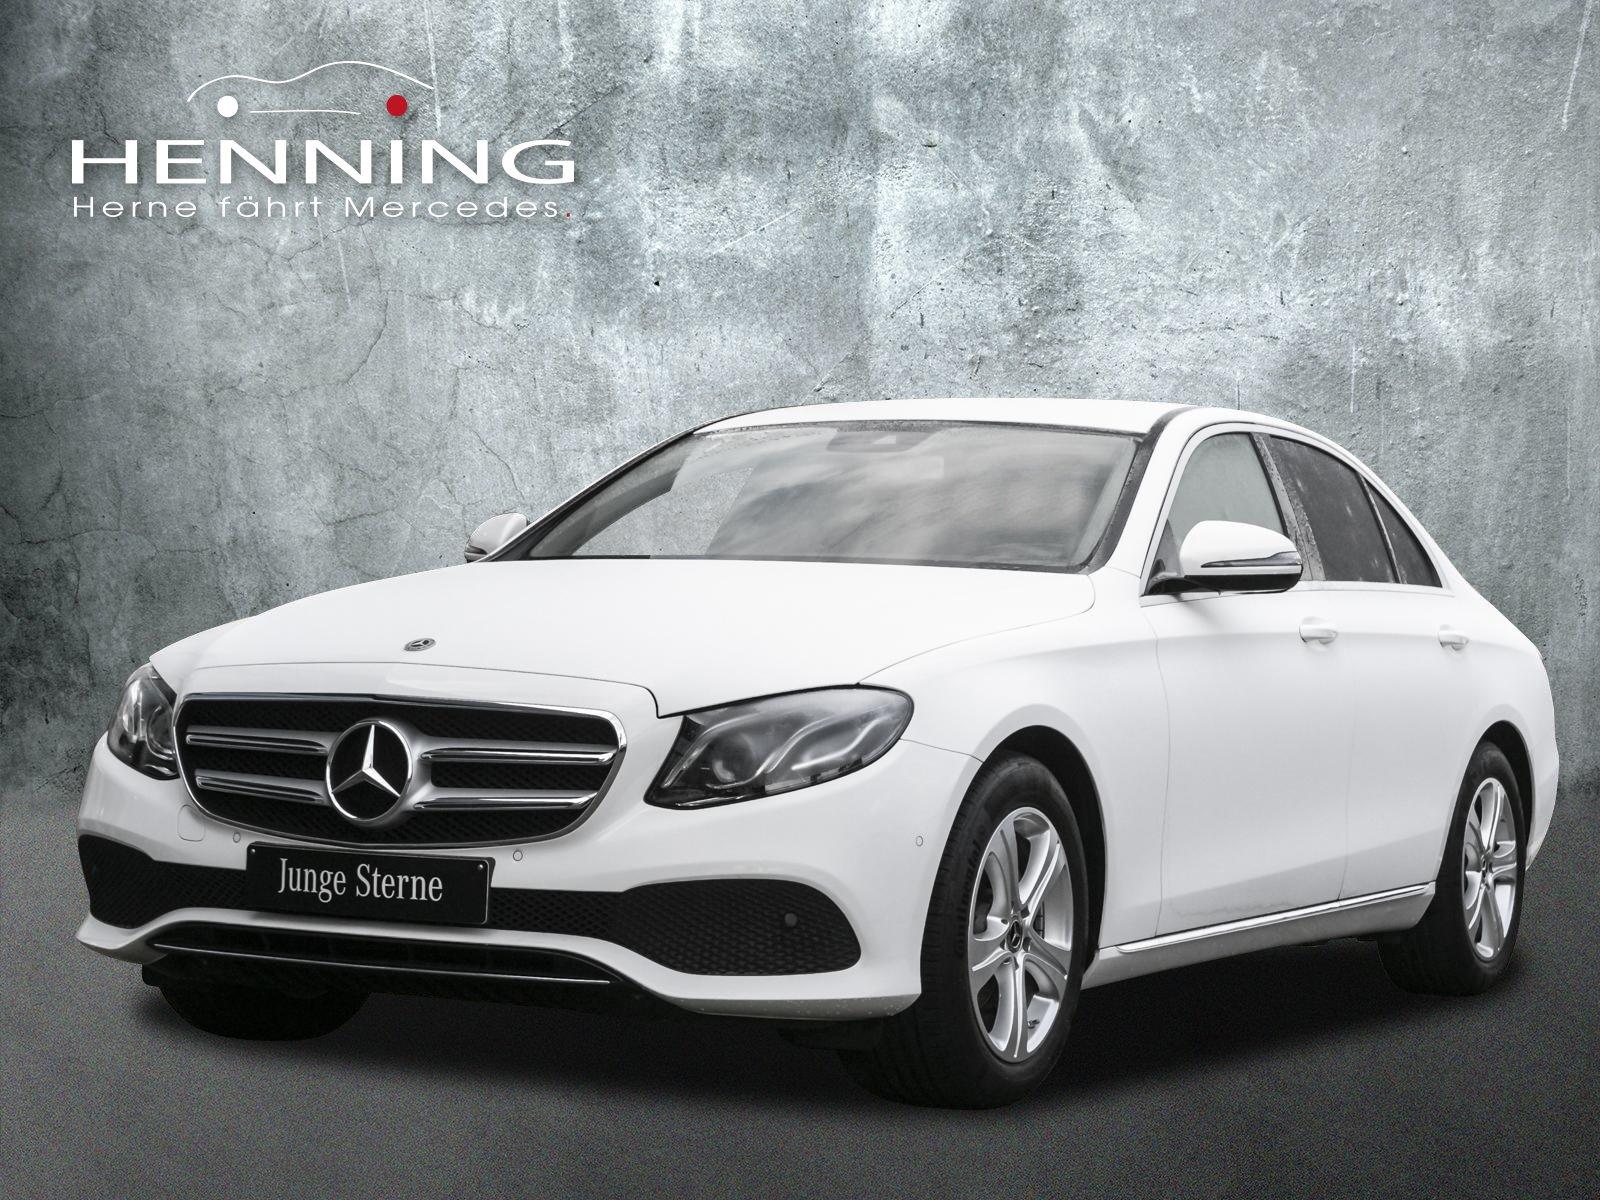 Mercedes-Benz E 200 Avantgarde 9G Multibeam Kamera Ambientebel, Jahr 2017, Benzin